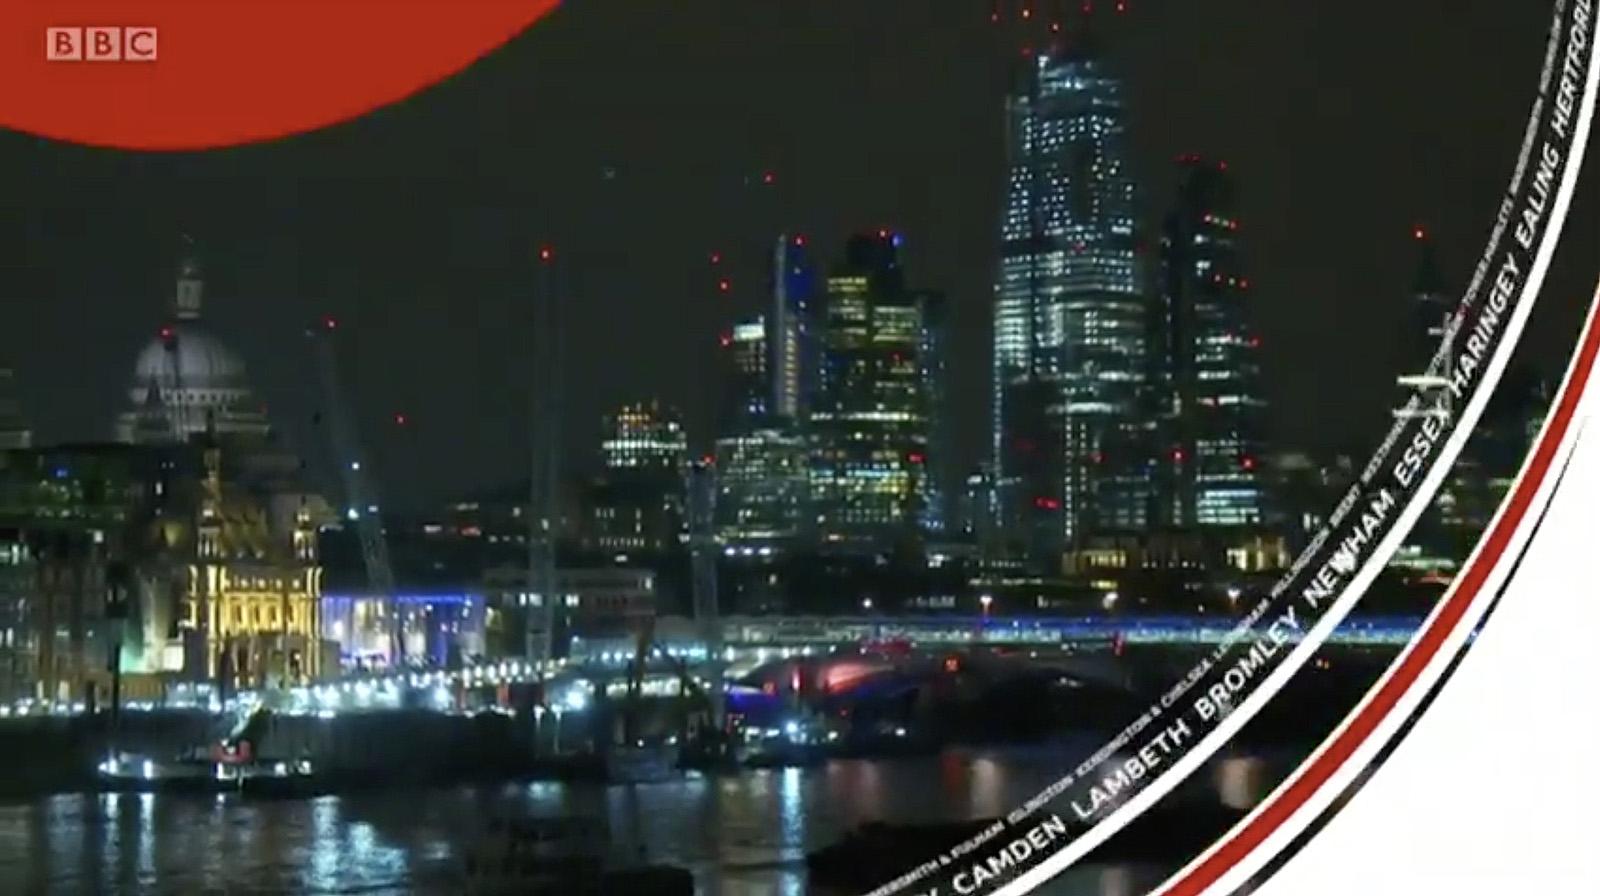 NCS_BBC-Rebrand-Reith-2019_050